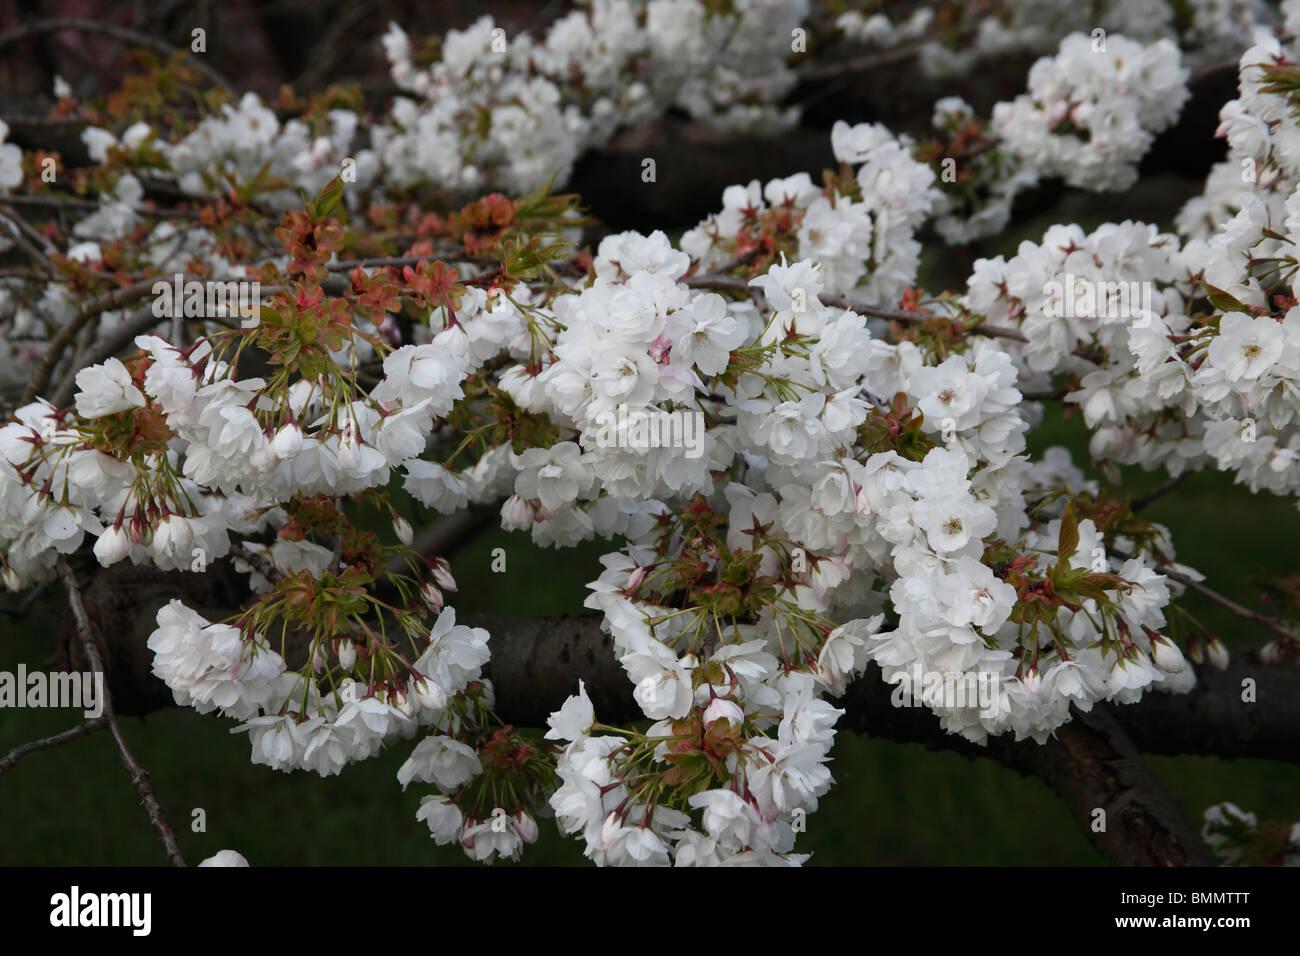 Prunus Shirolae tree in flower - Stock Image